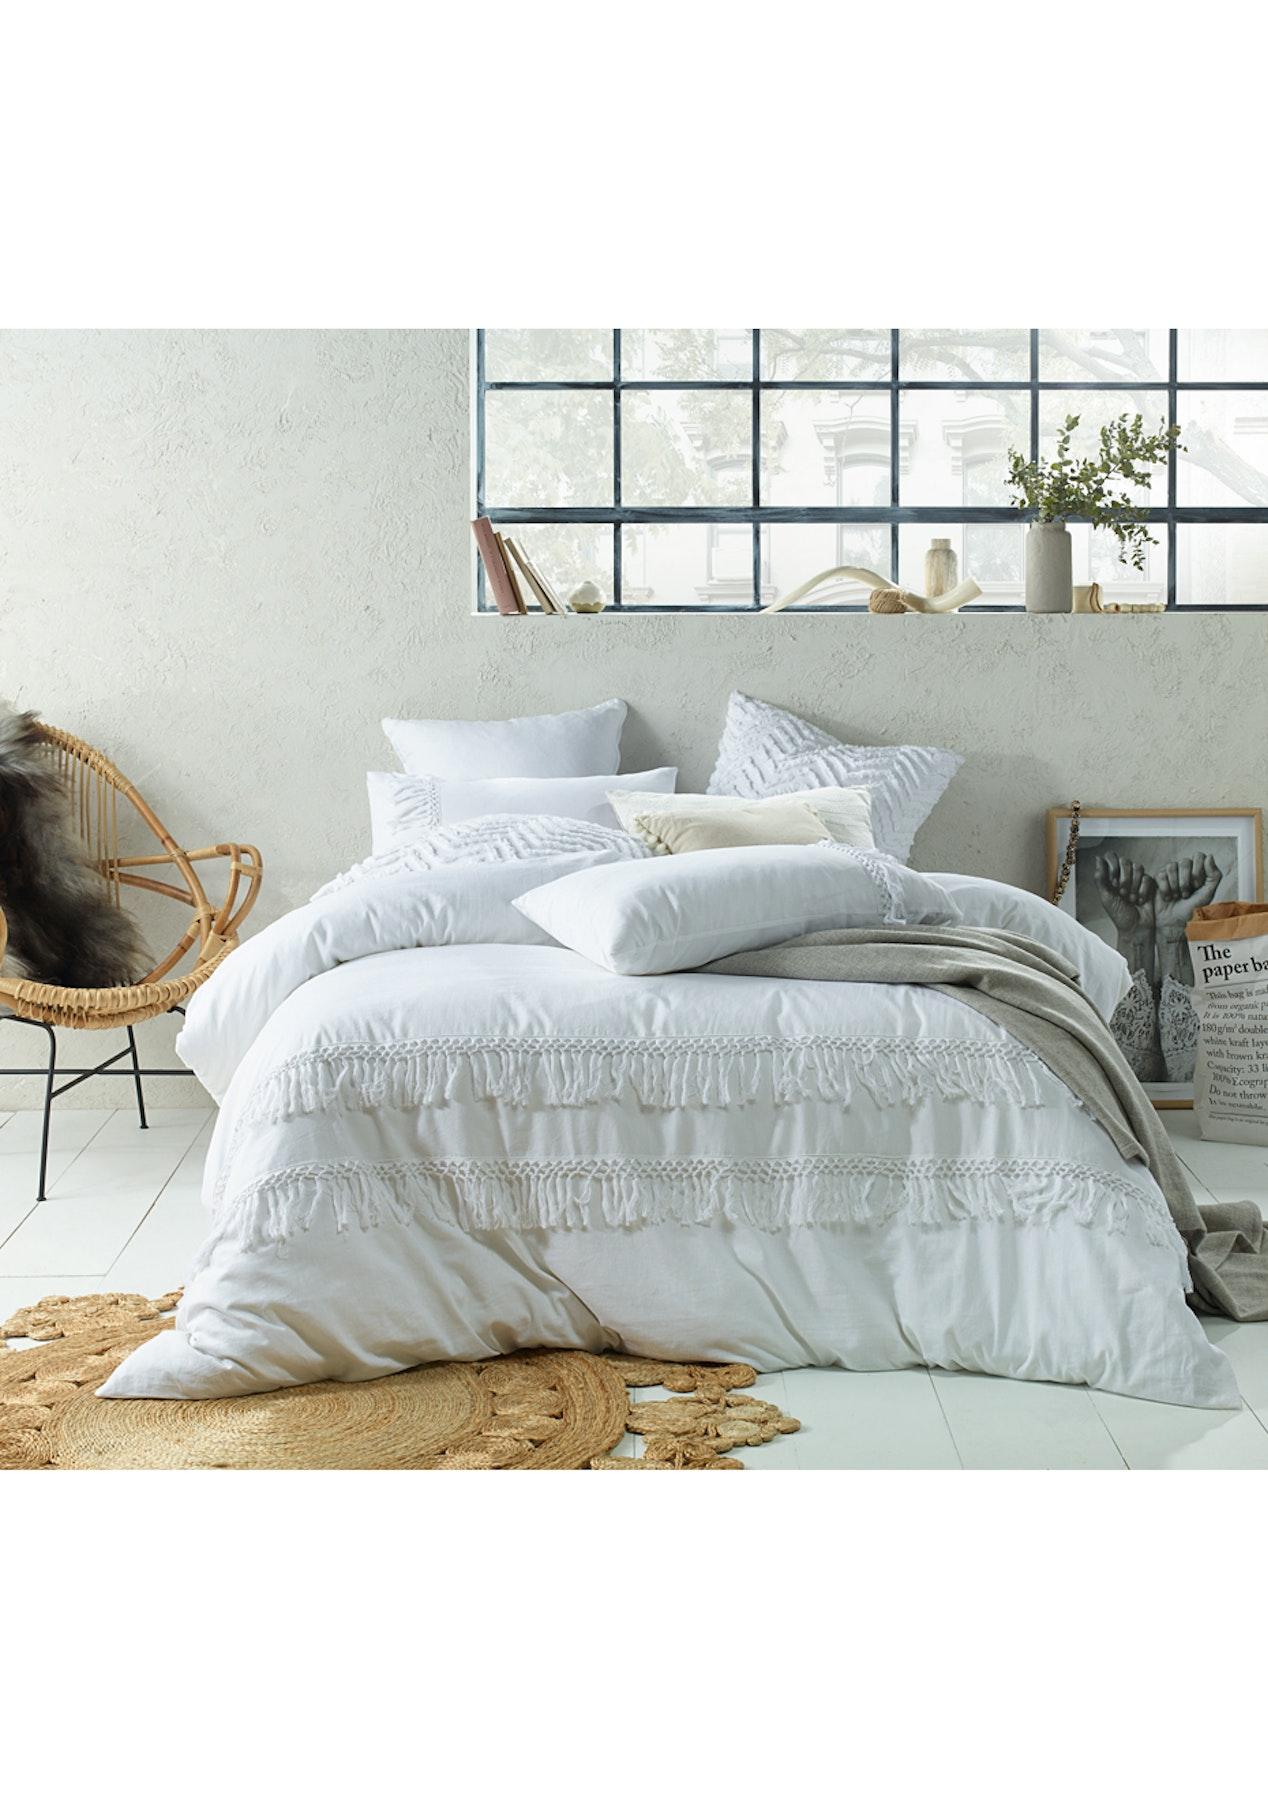 linen home dp com amazon kitchen coal duvet queen duvets washed cover